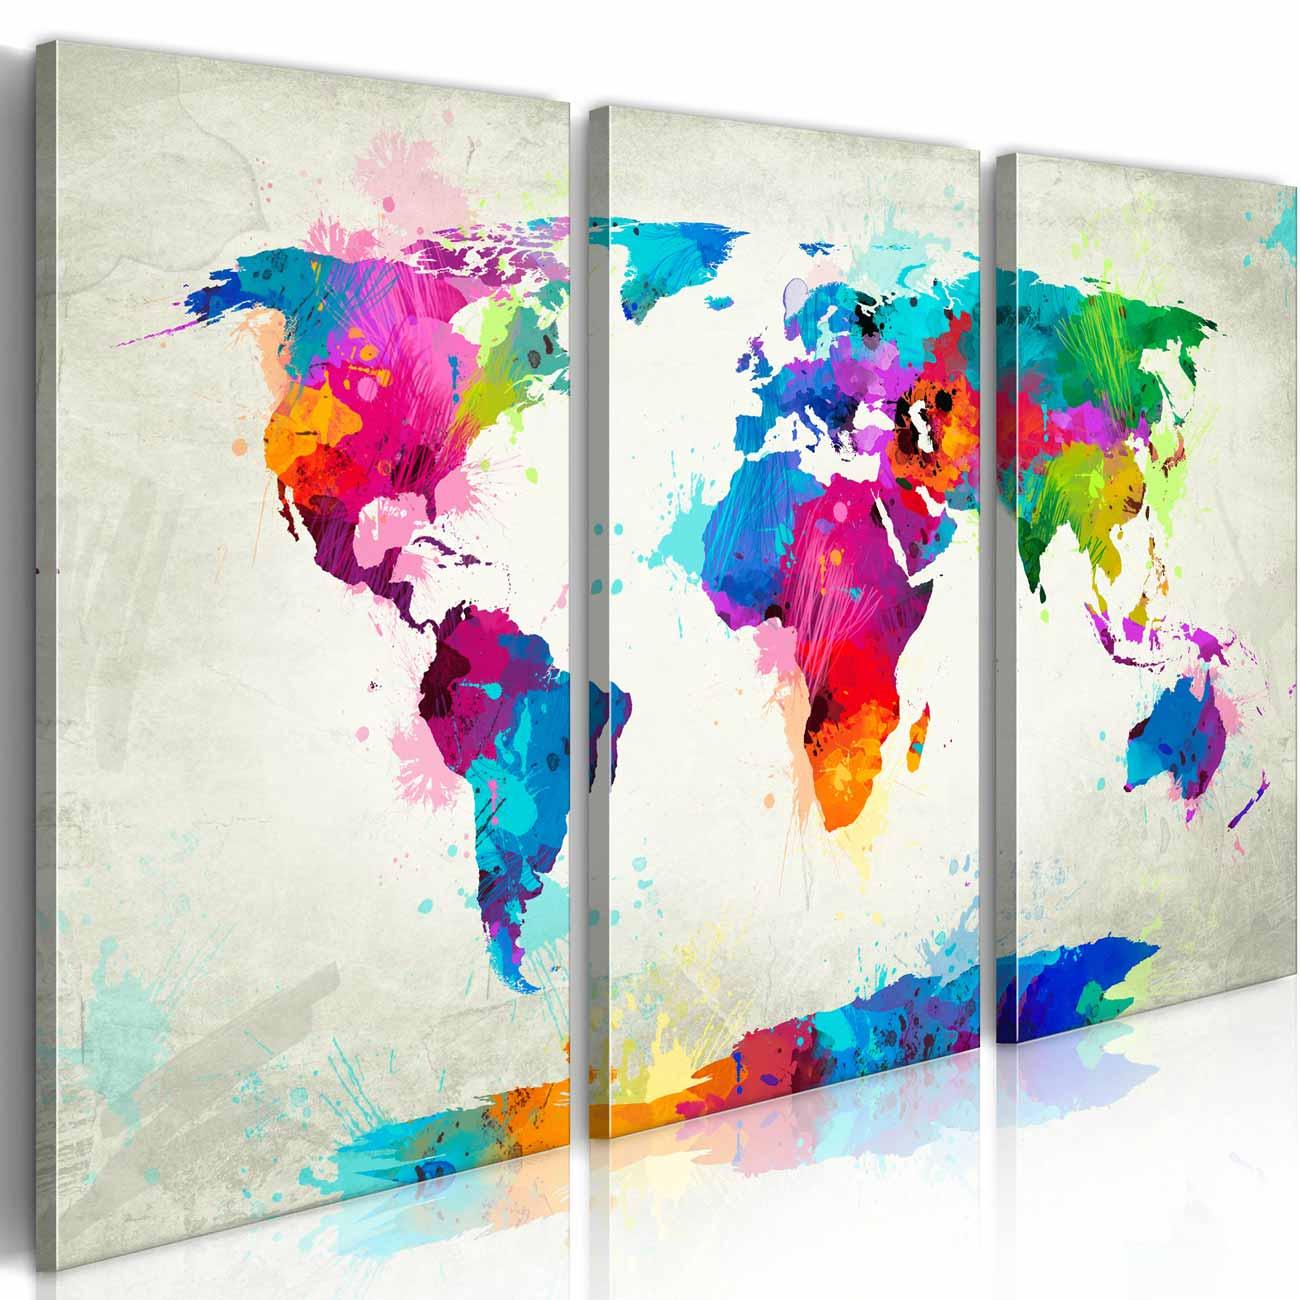 ARTGEIST Verdenskort An Explosion of Colors billede - multifarvet print, 2 størrelser 60x40